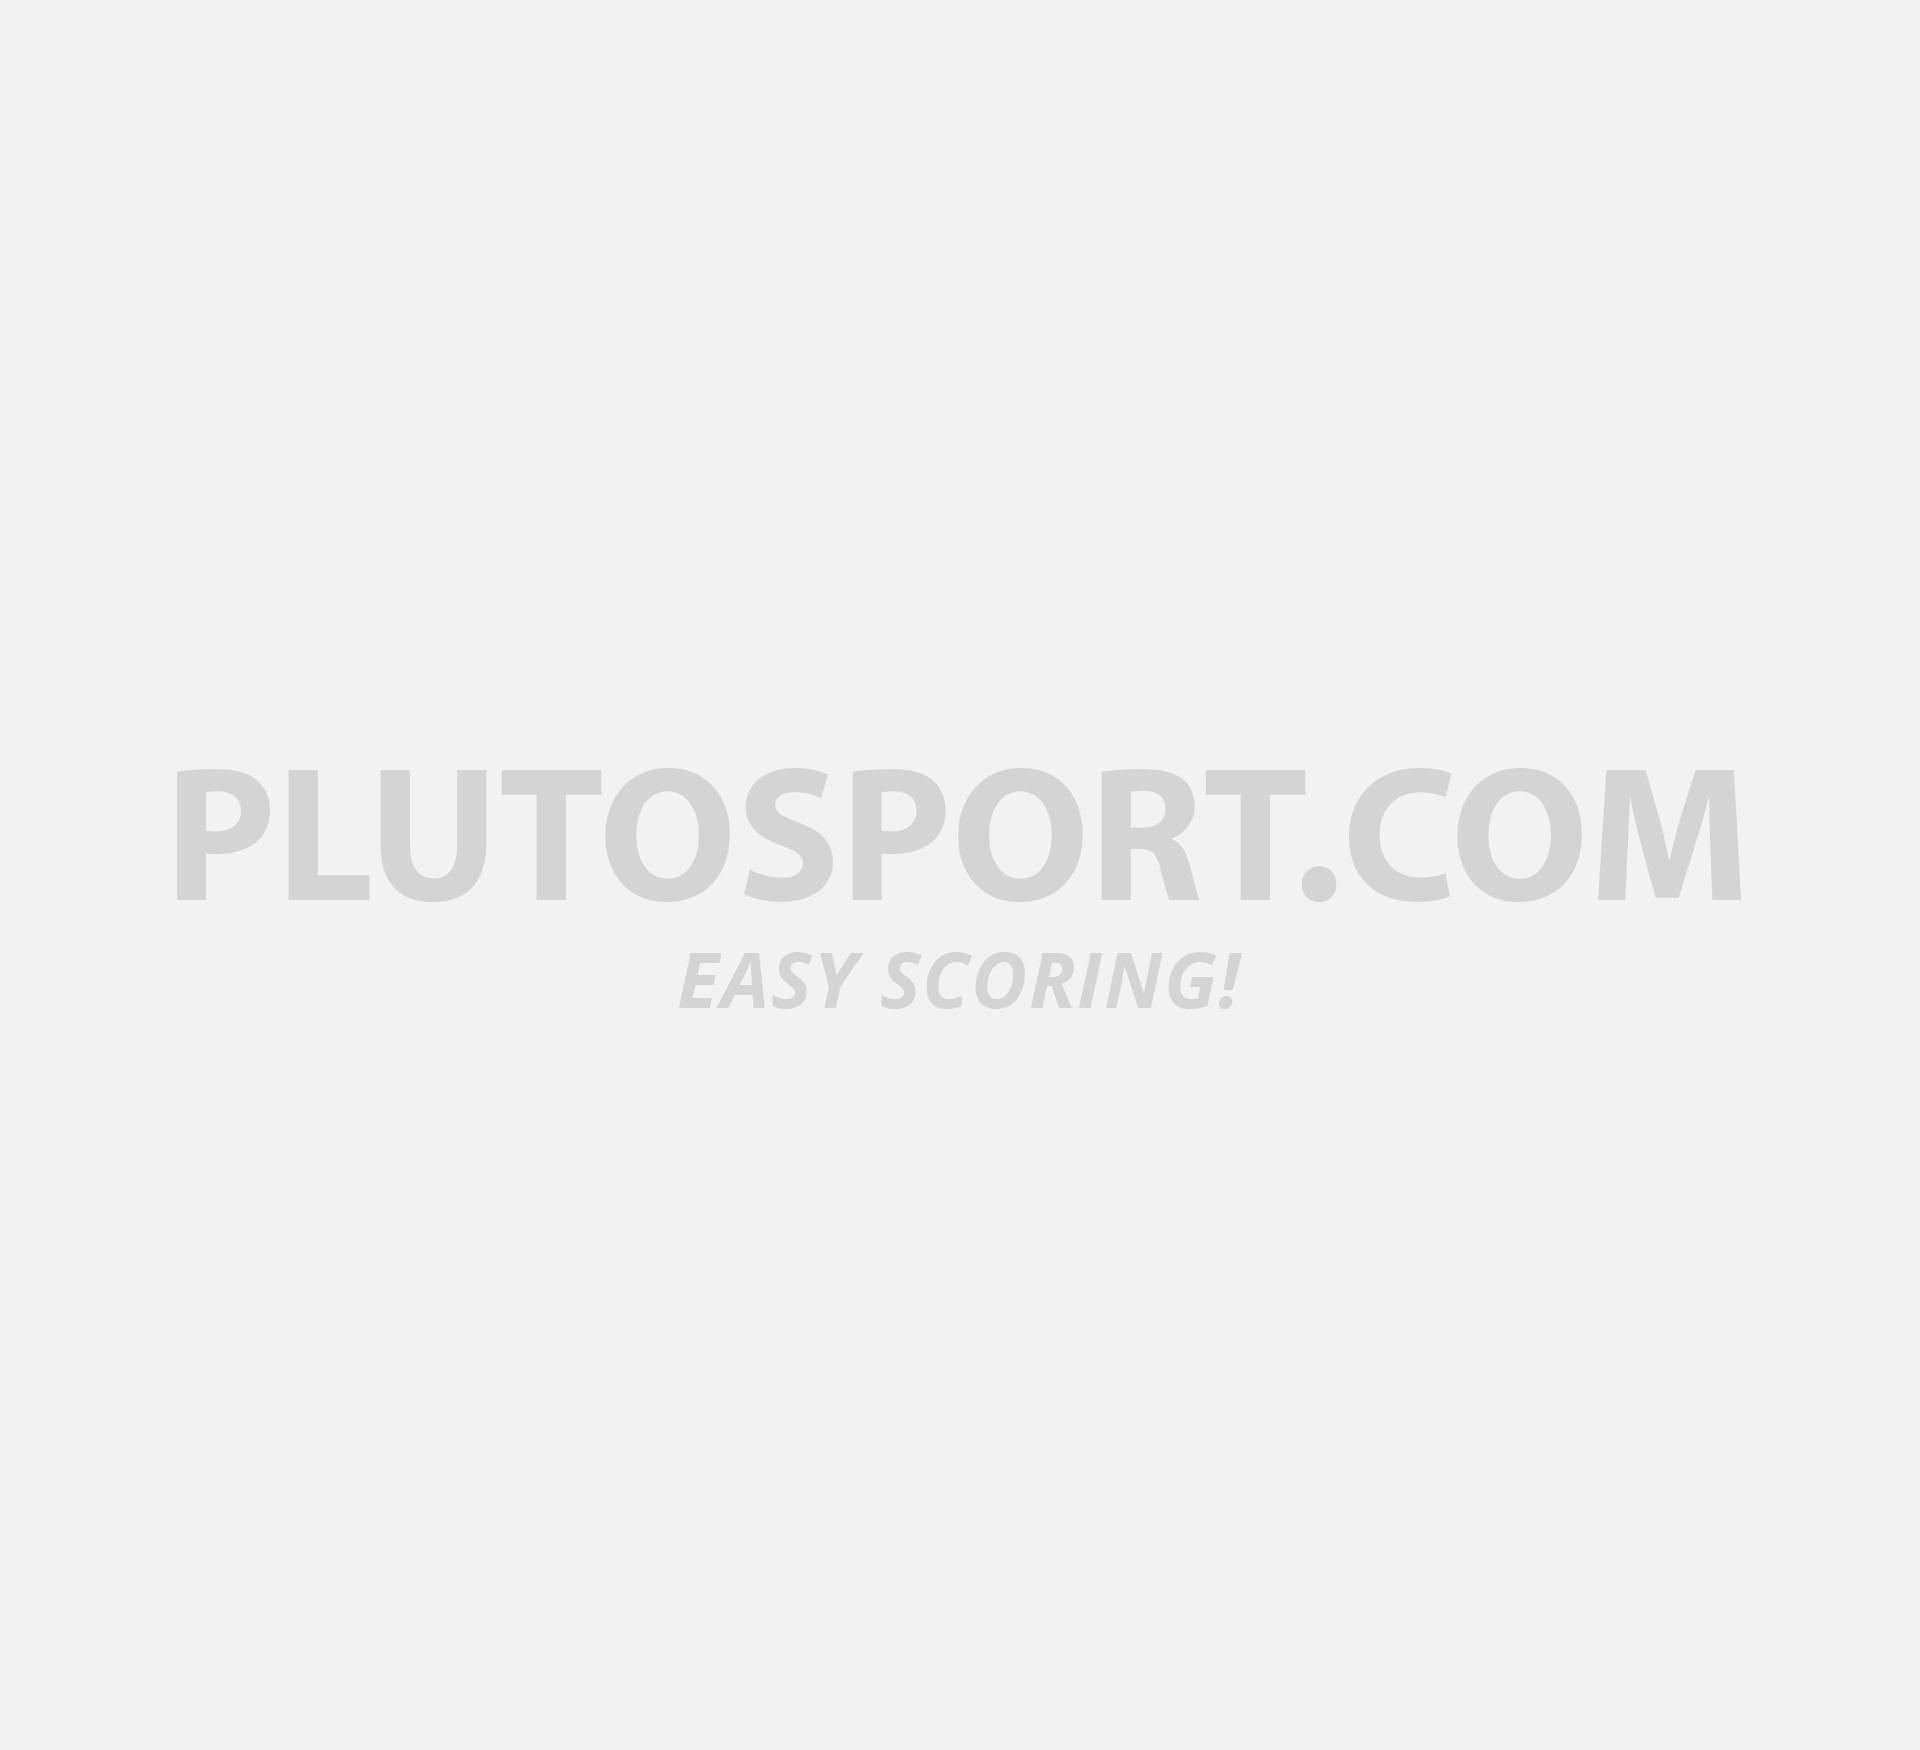 ce2052856 Tenson Zeus - Ski pants - Clothing - Wintersport - Sports | Plutosport